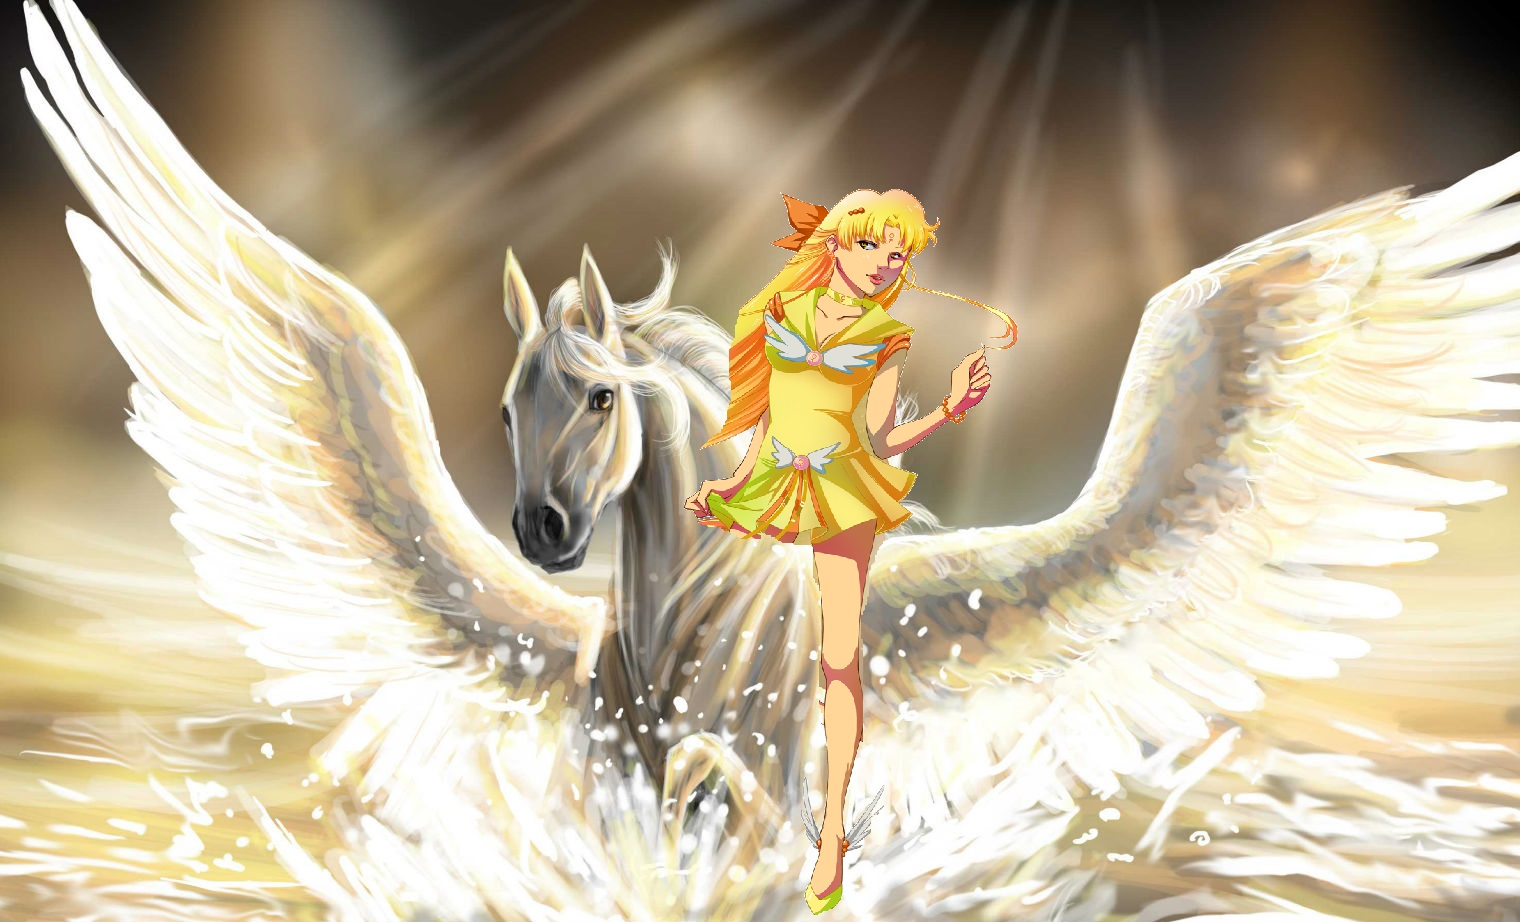 greek goddess images aphrodite riding on her beautiful pegasus hd